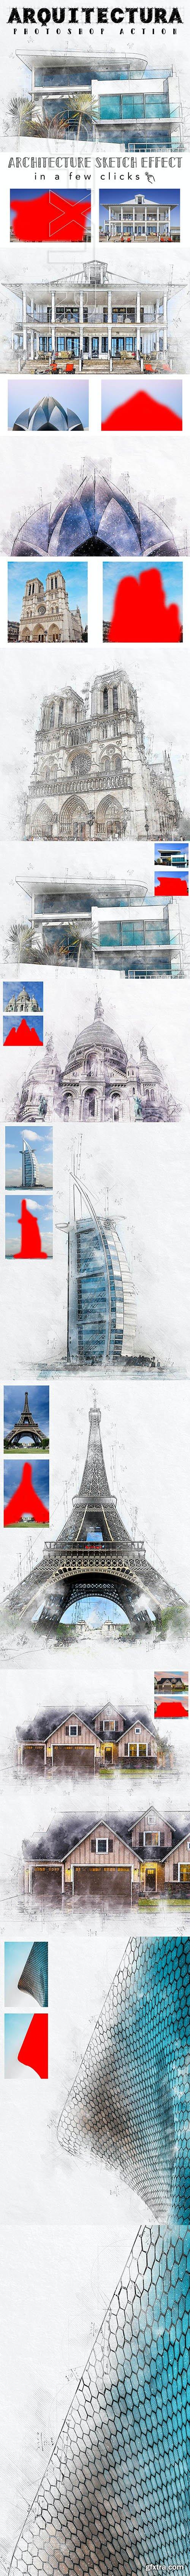 GraphicRiver - Arquitectura - Architecture Sketch Photoshop Action 26013208